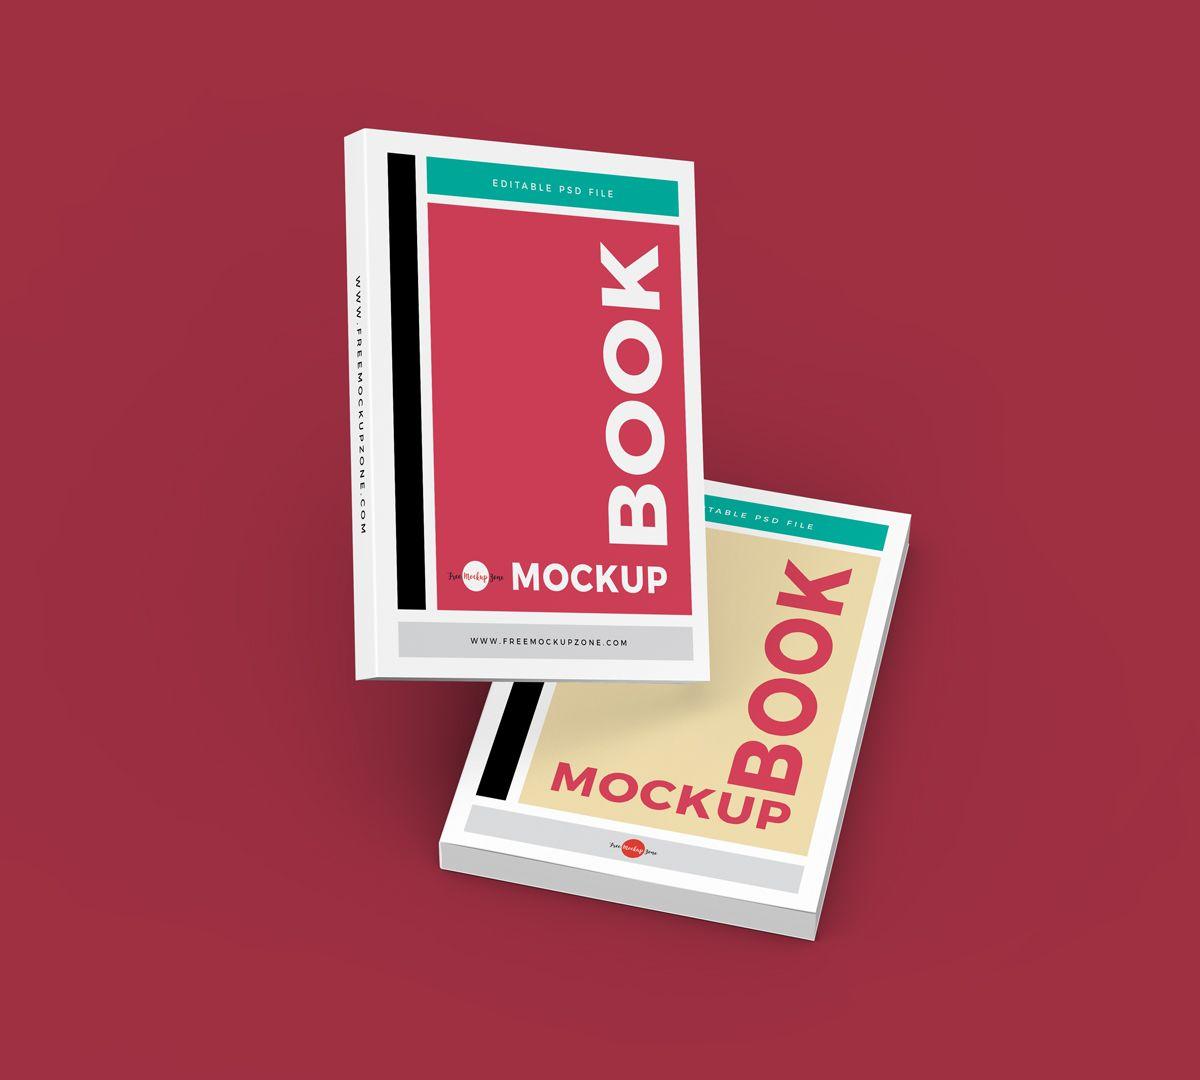 Free Branding Books Mockup Psd 3 Mockup Psd Mockup Books